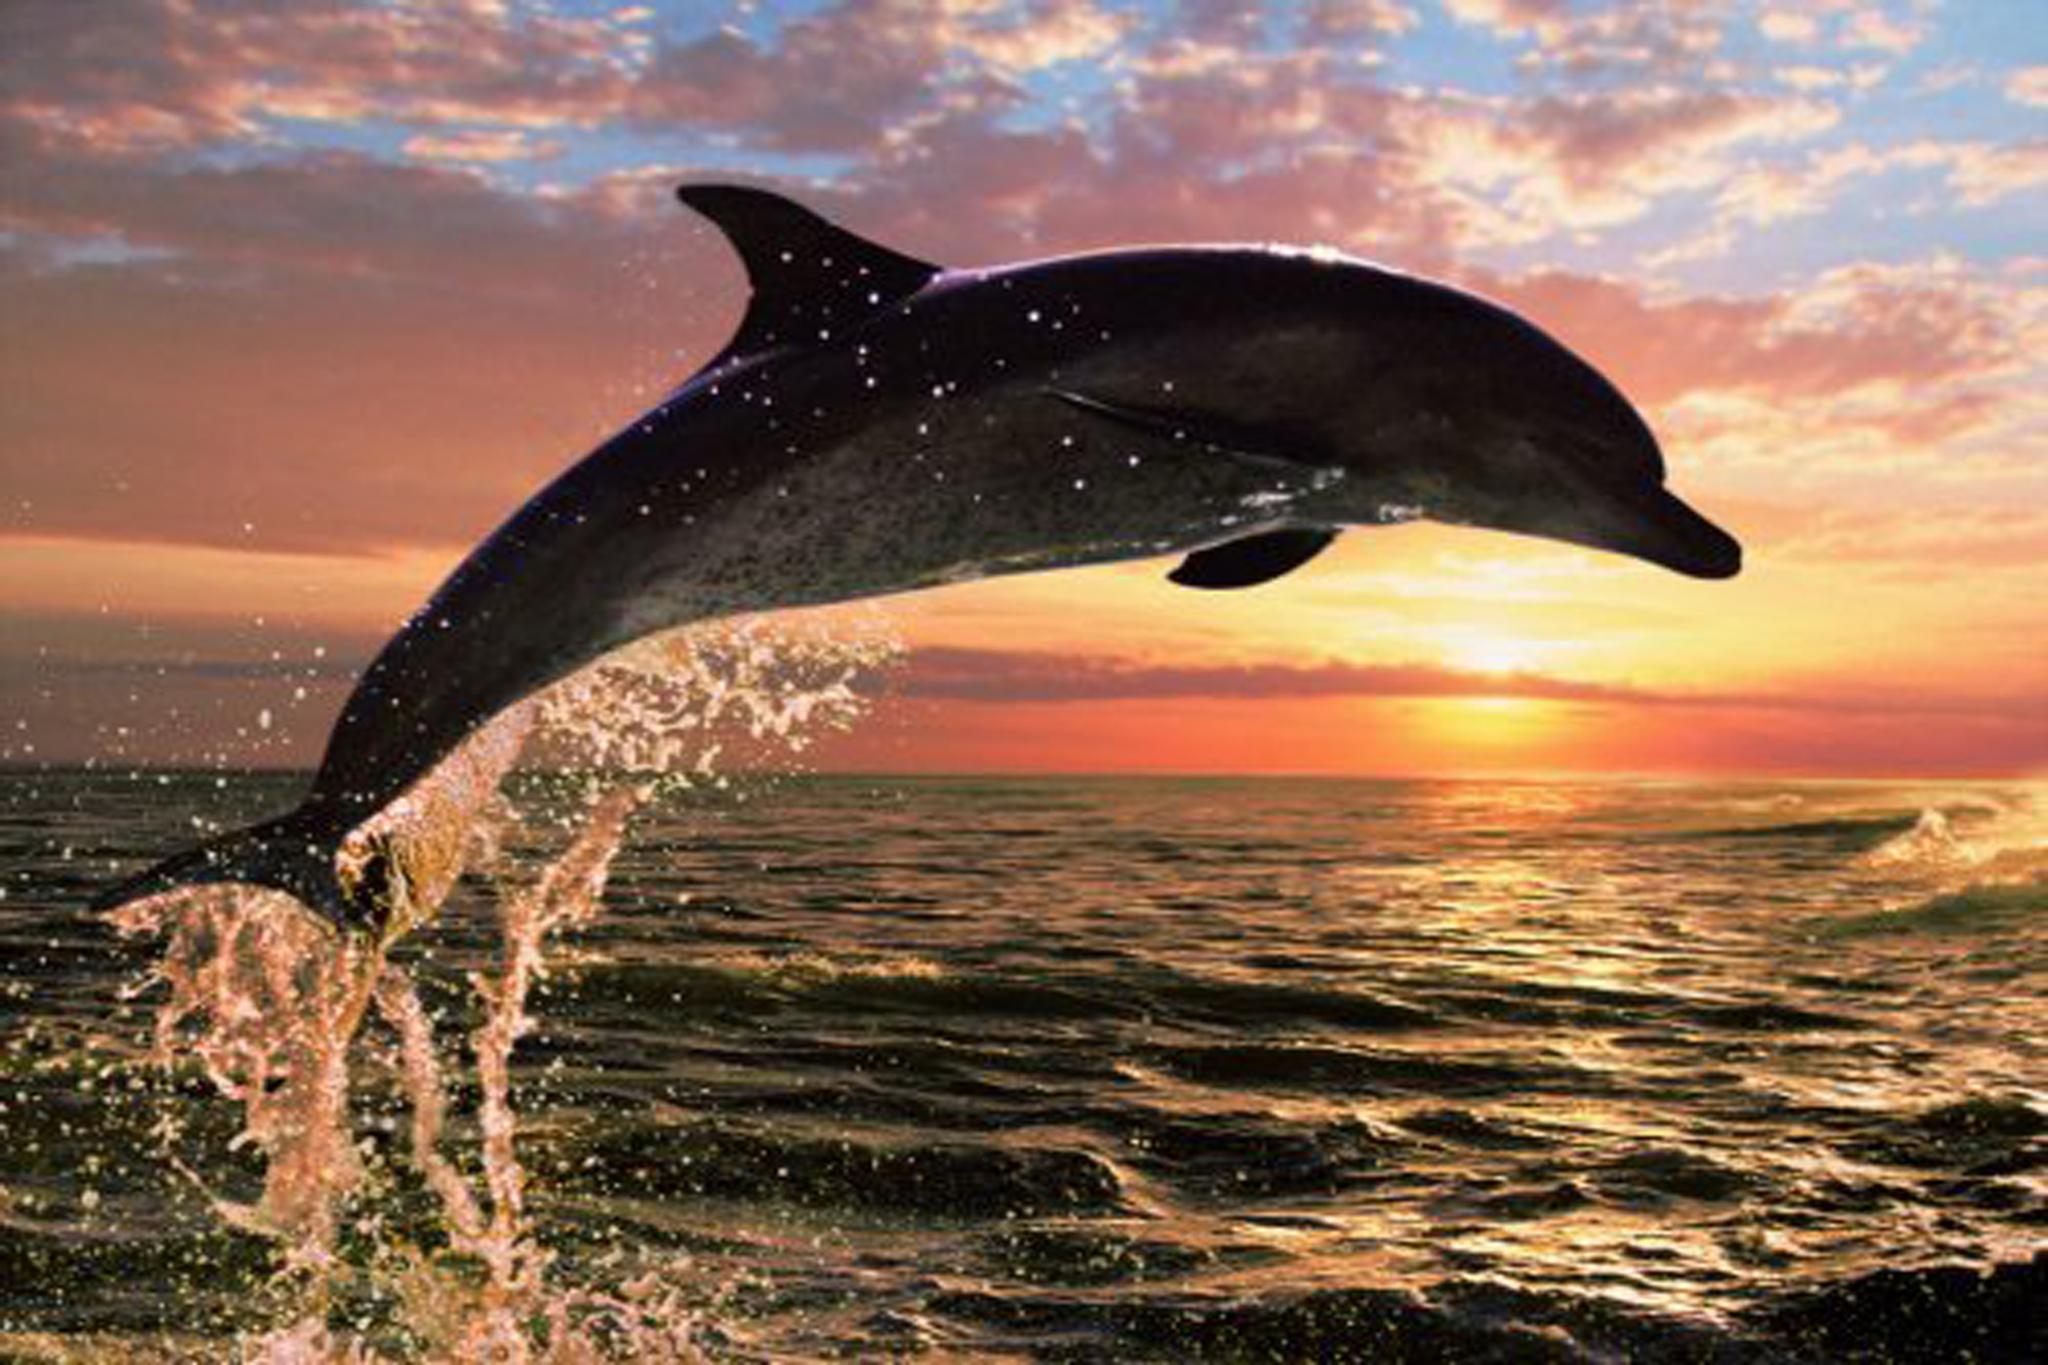 Dolphin Sunset by christiancorbett7